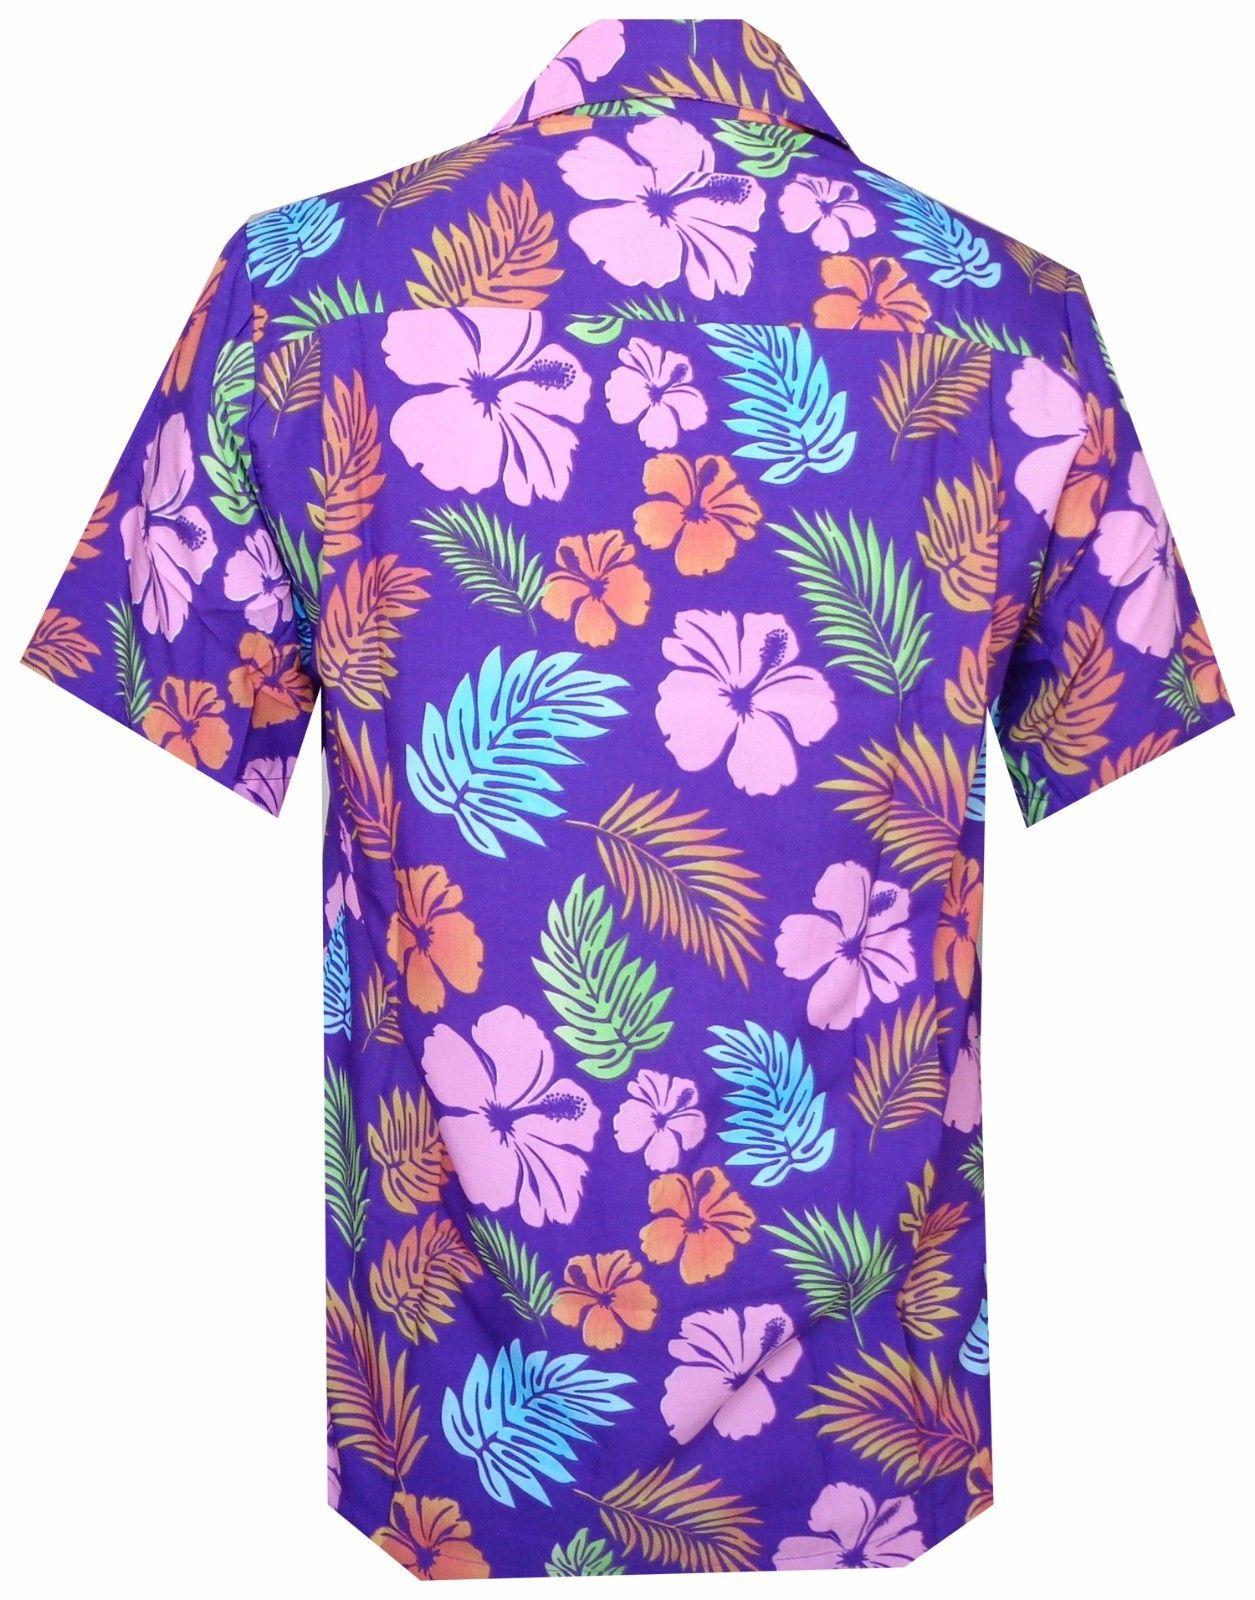 Hawaiian-Shirt-Mens-Hibiscus-Floral-Leaf-Print-Beach-Aloha-Camp-Party thumbnail 14